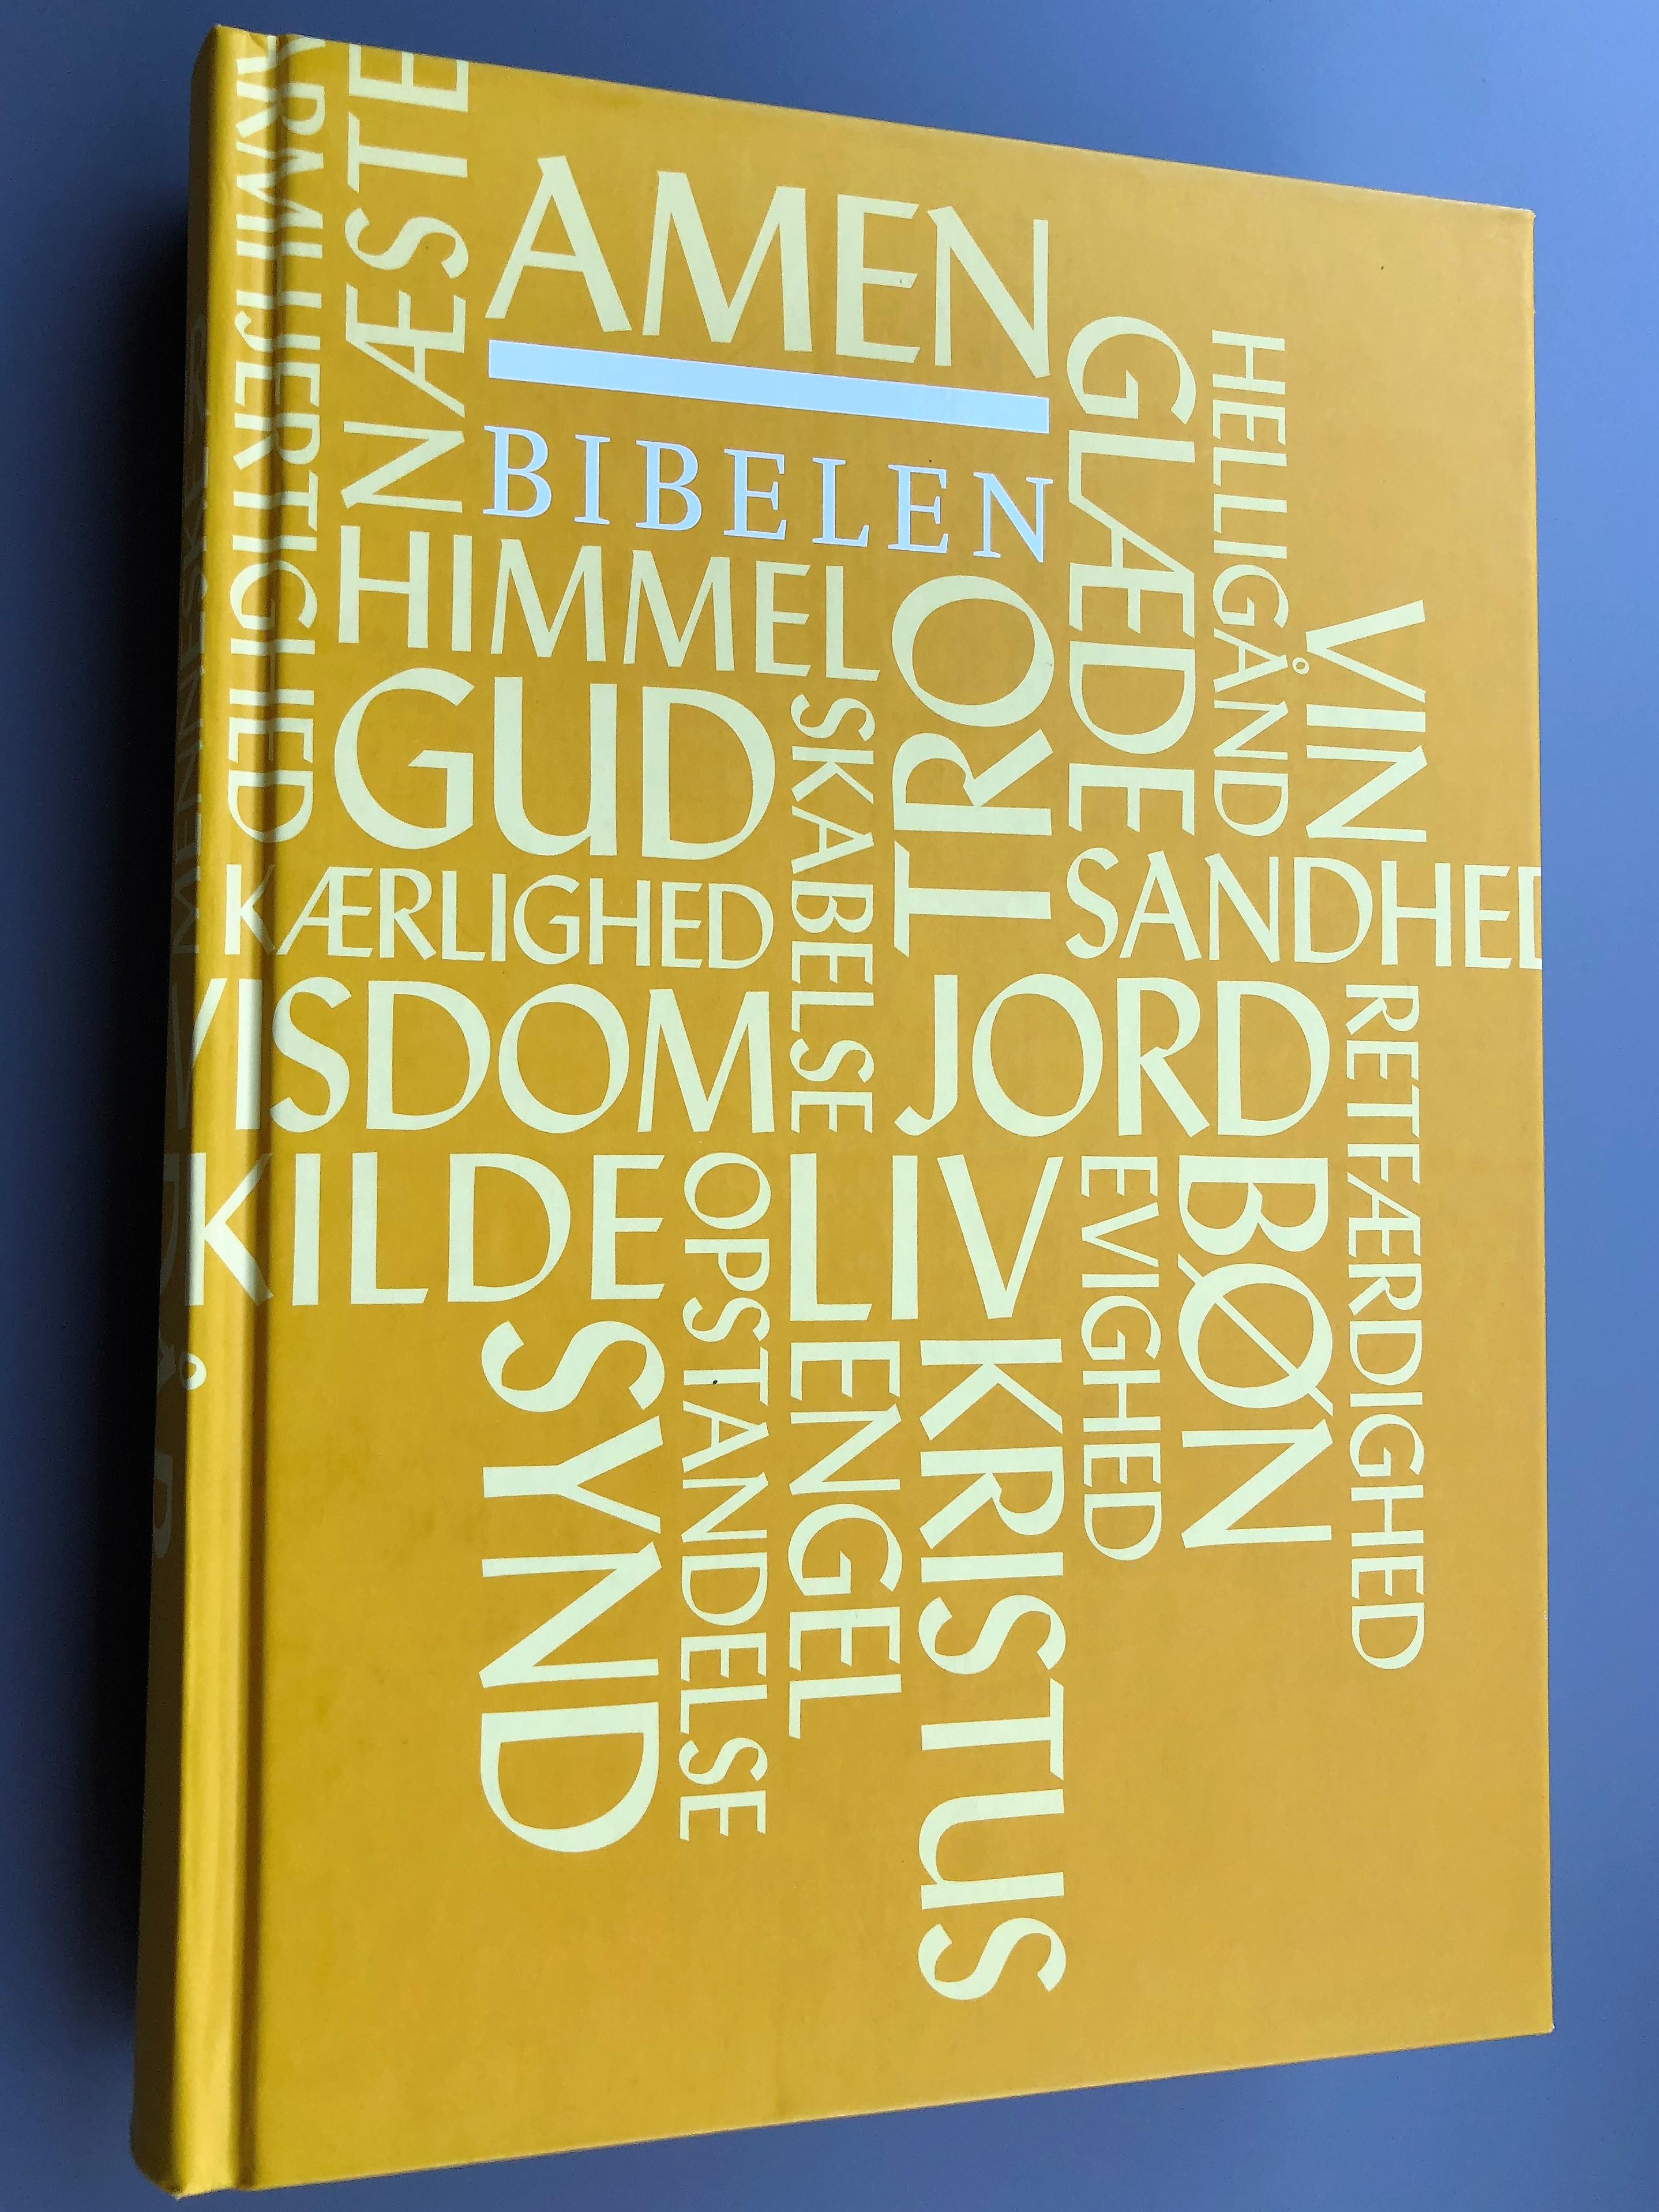 danish-bible-1-.jpg